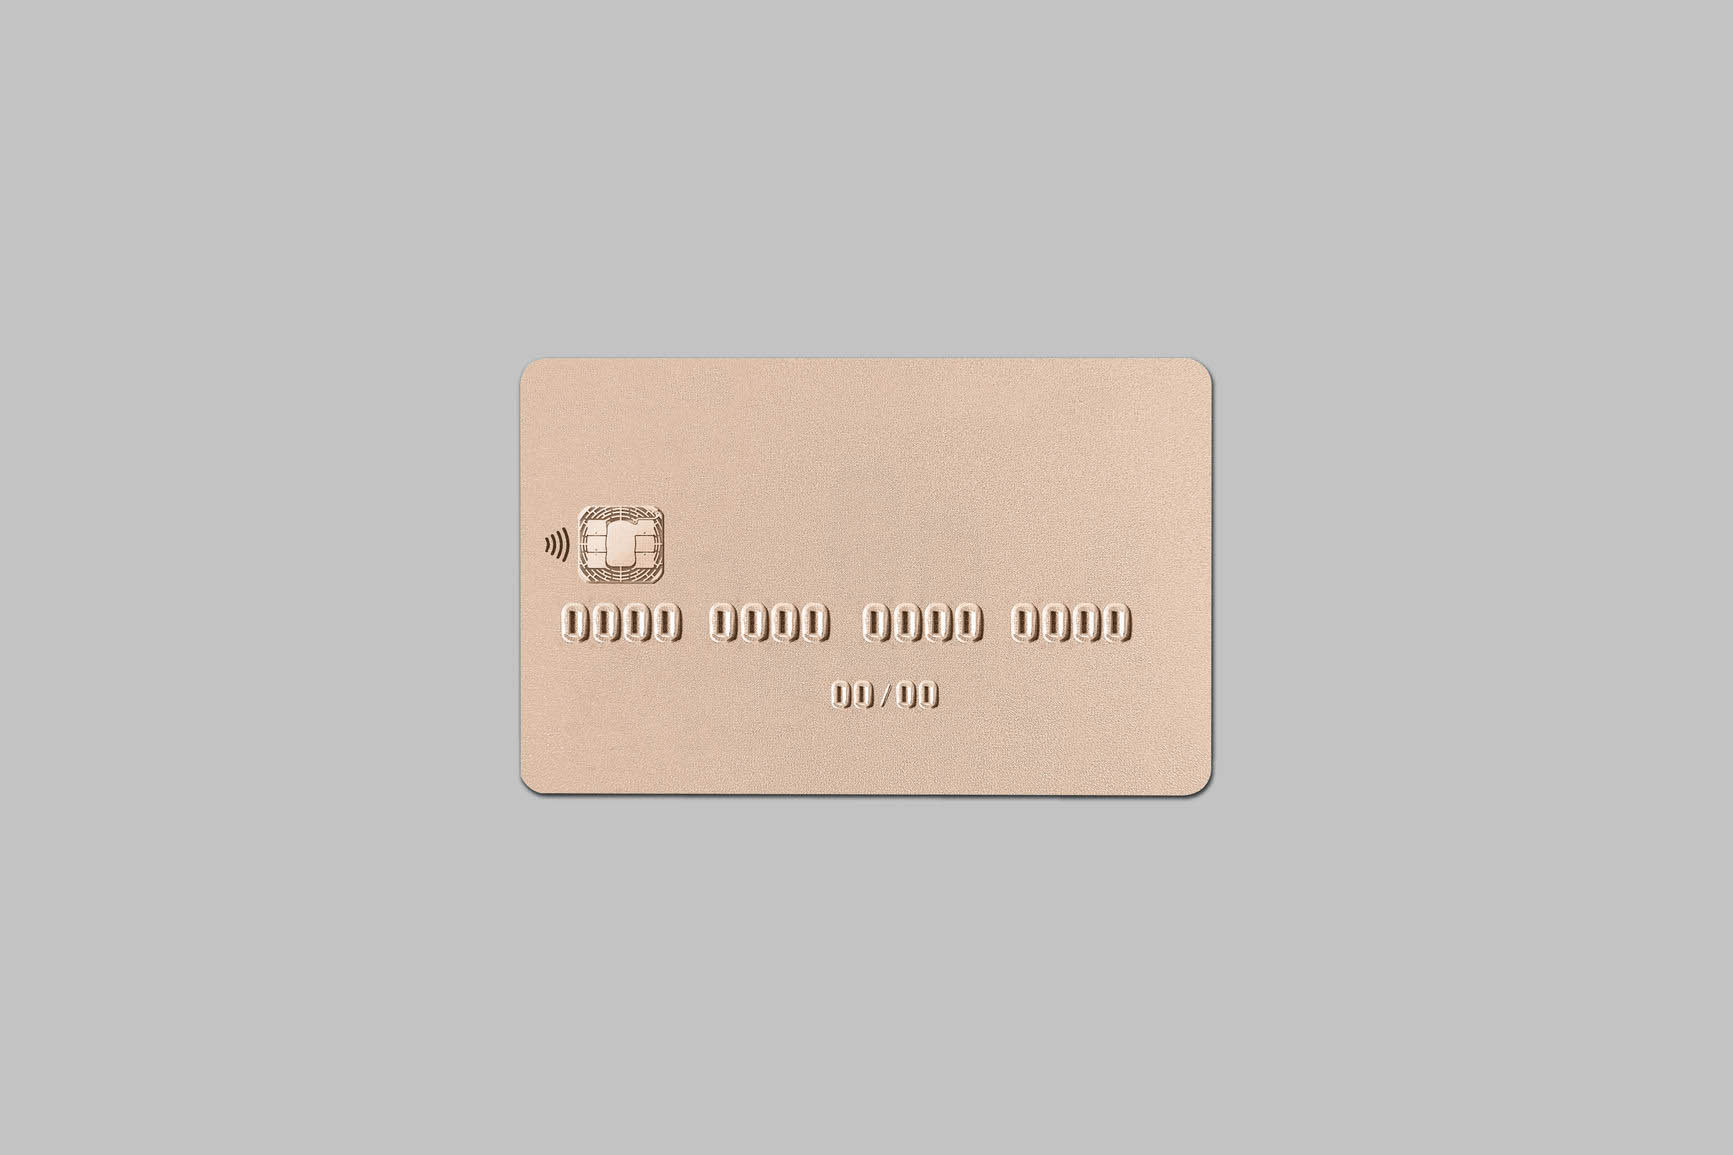 free-and-native-credit-card.jpg